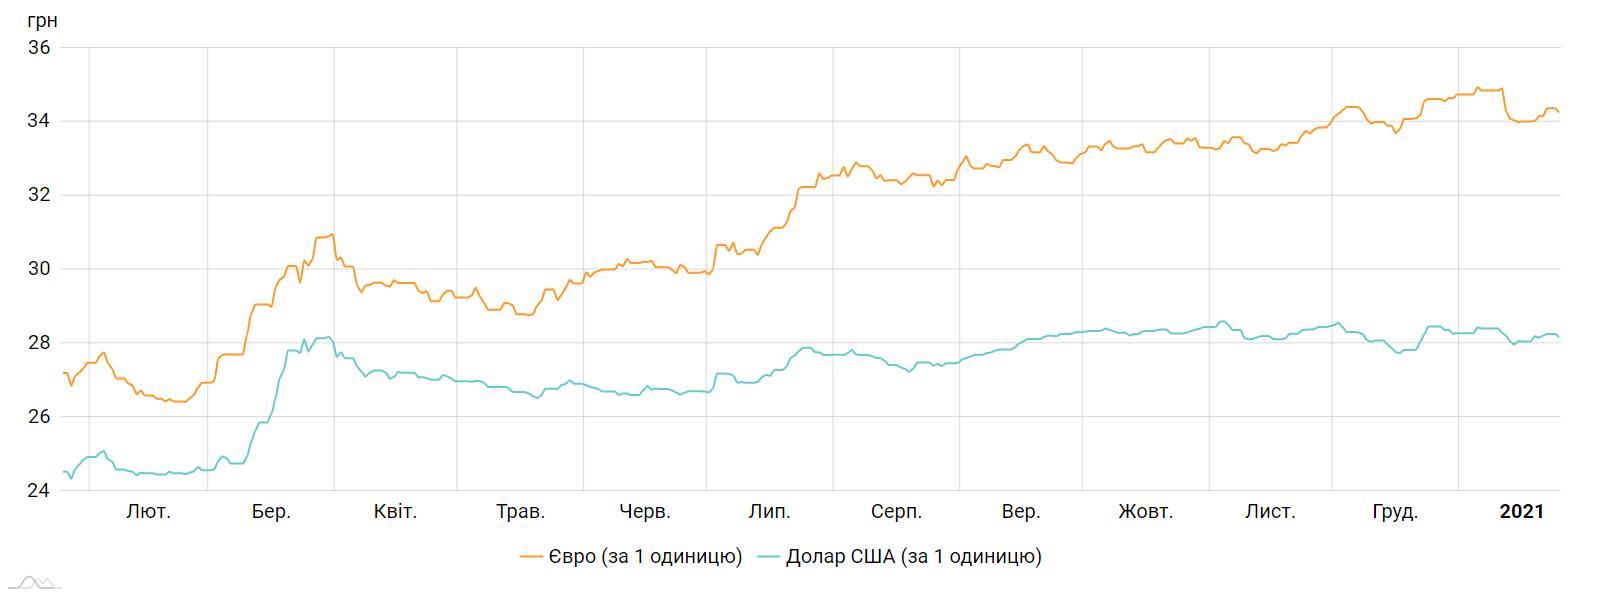 Доллар и евро упали в цене